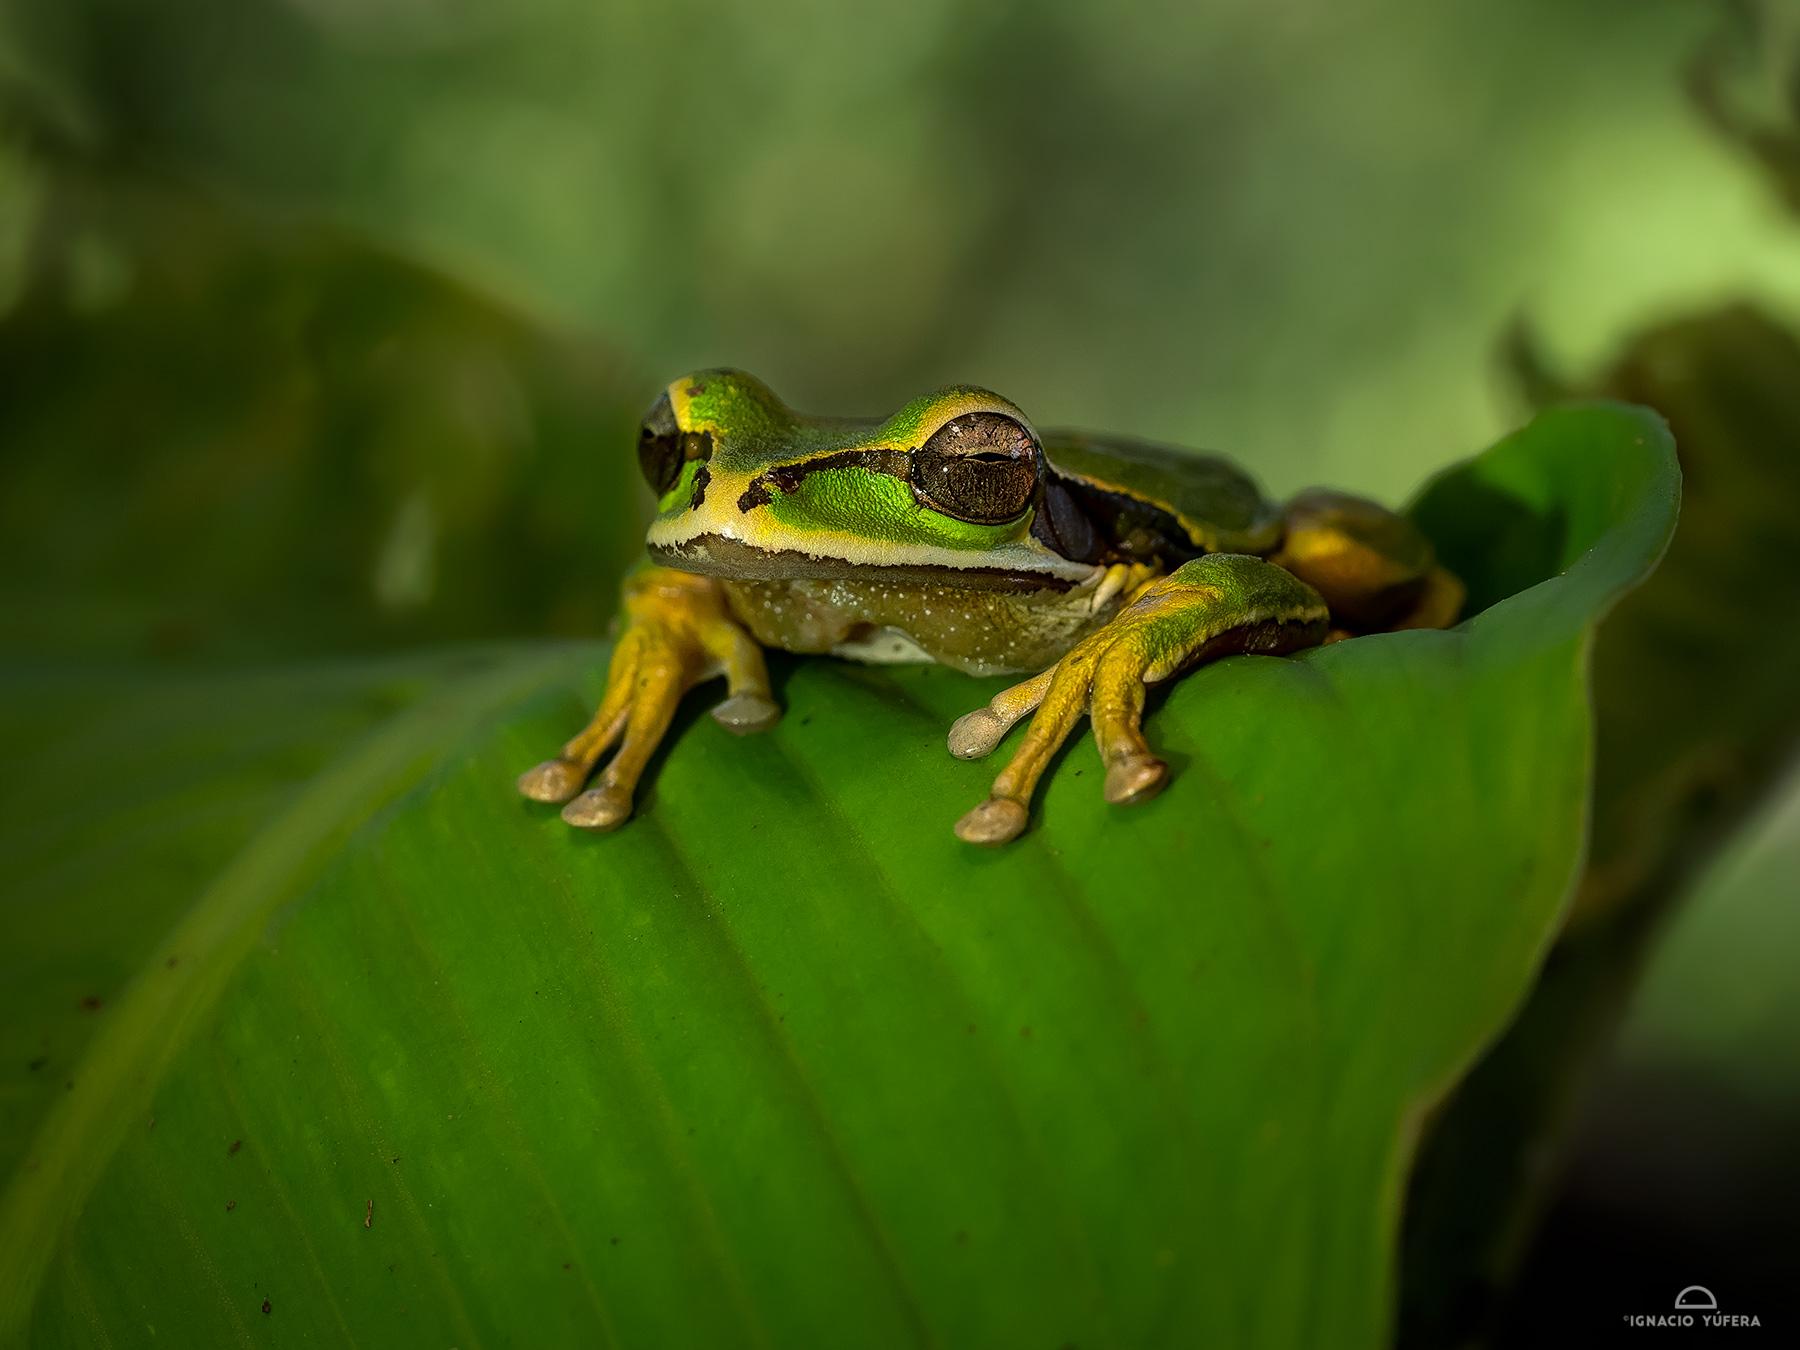 Cross-banded Treefrog (Smilisca phaeota), Costa Rica